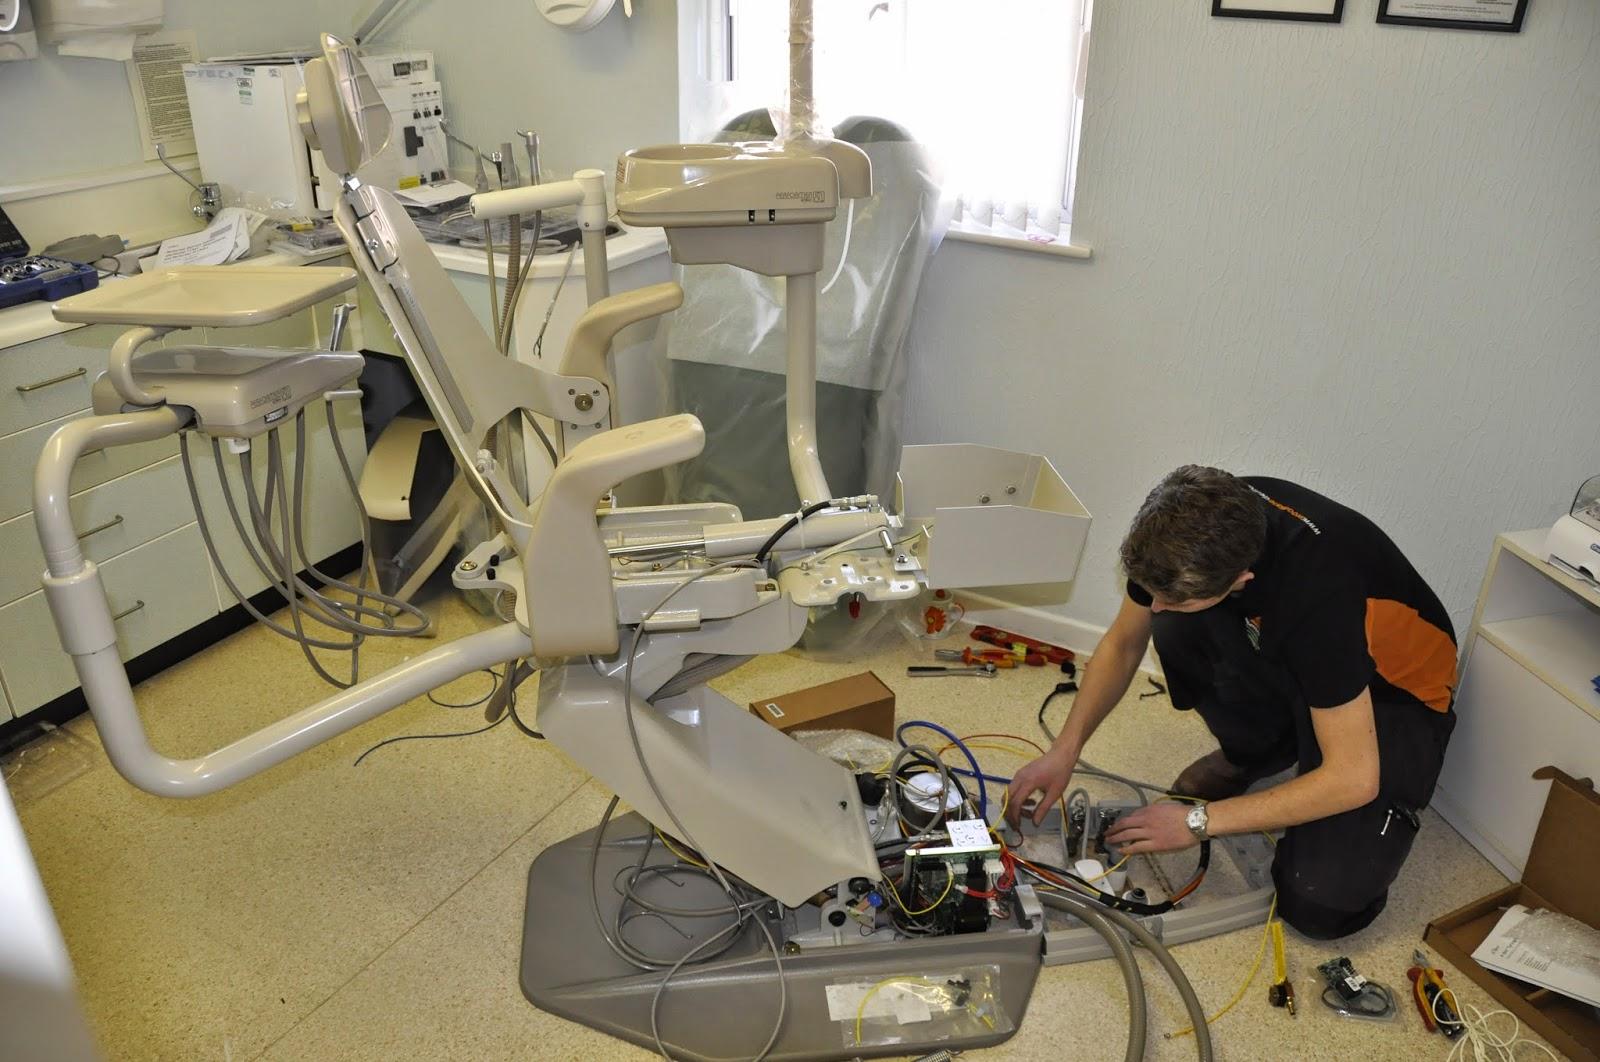 Woodlane Dental Equipment Ltd